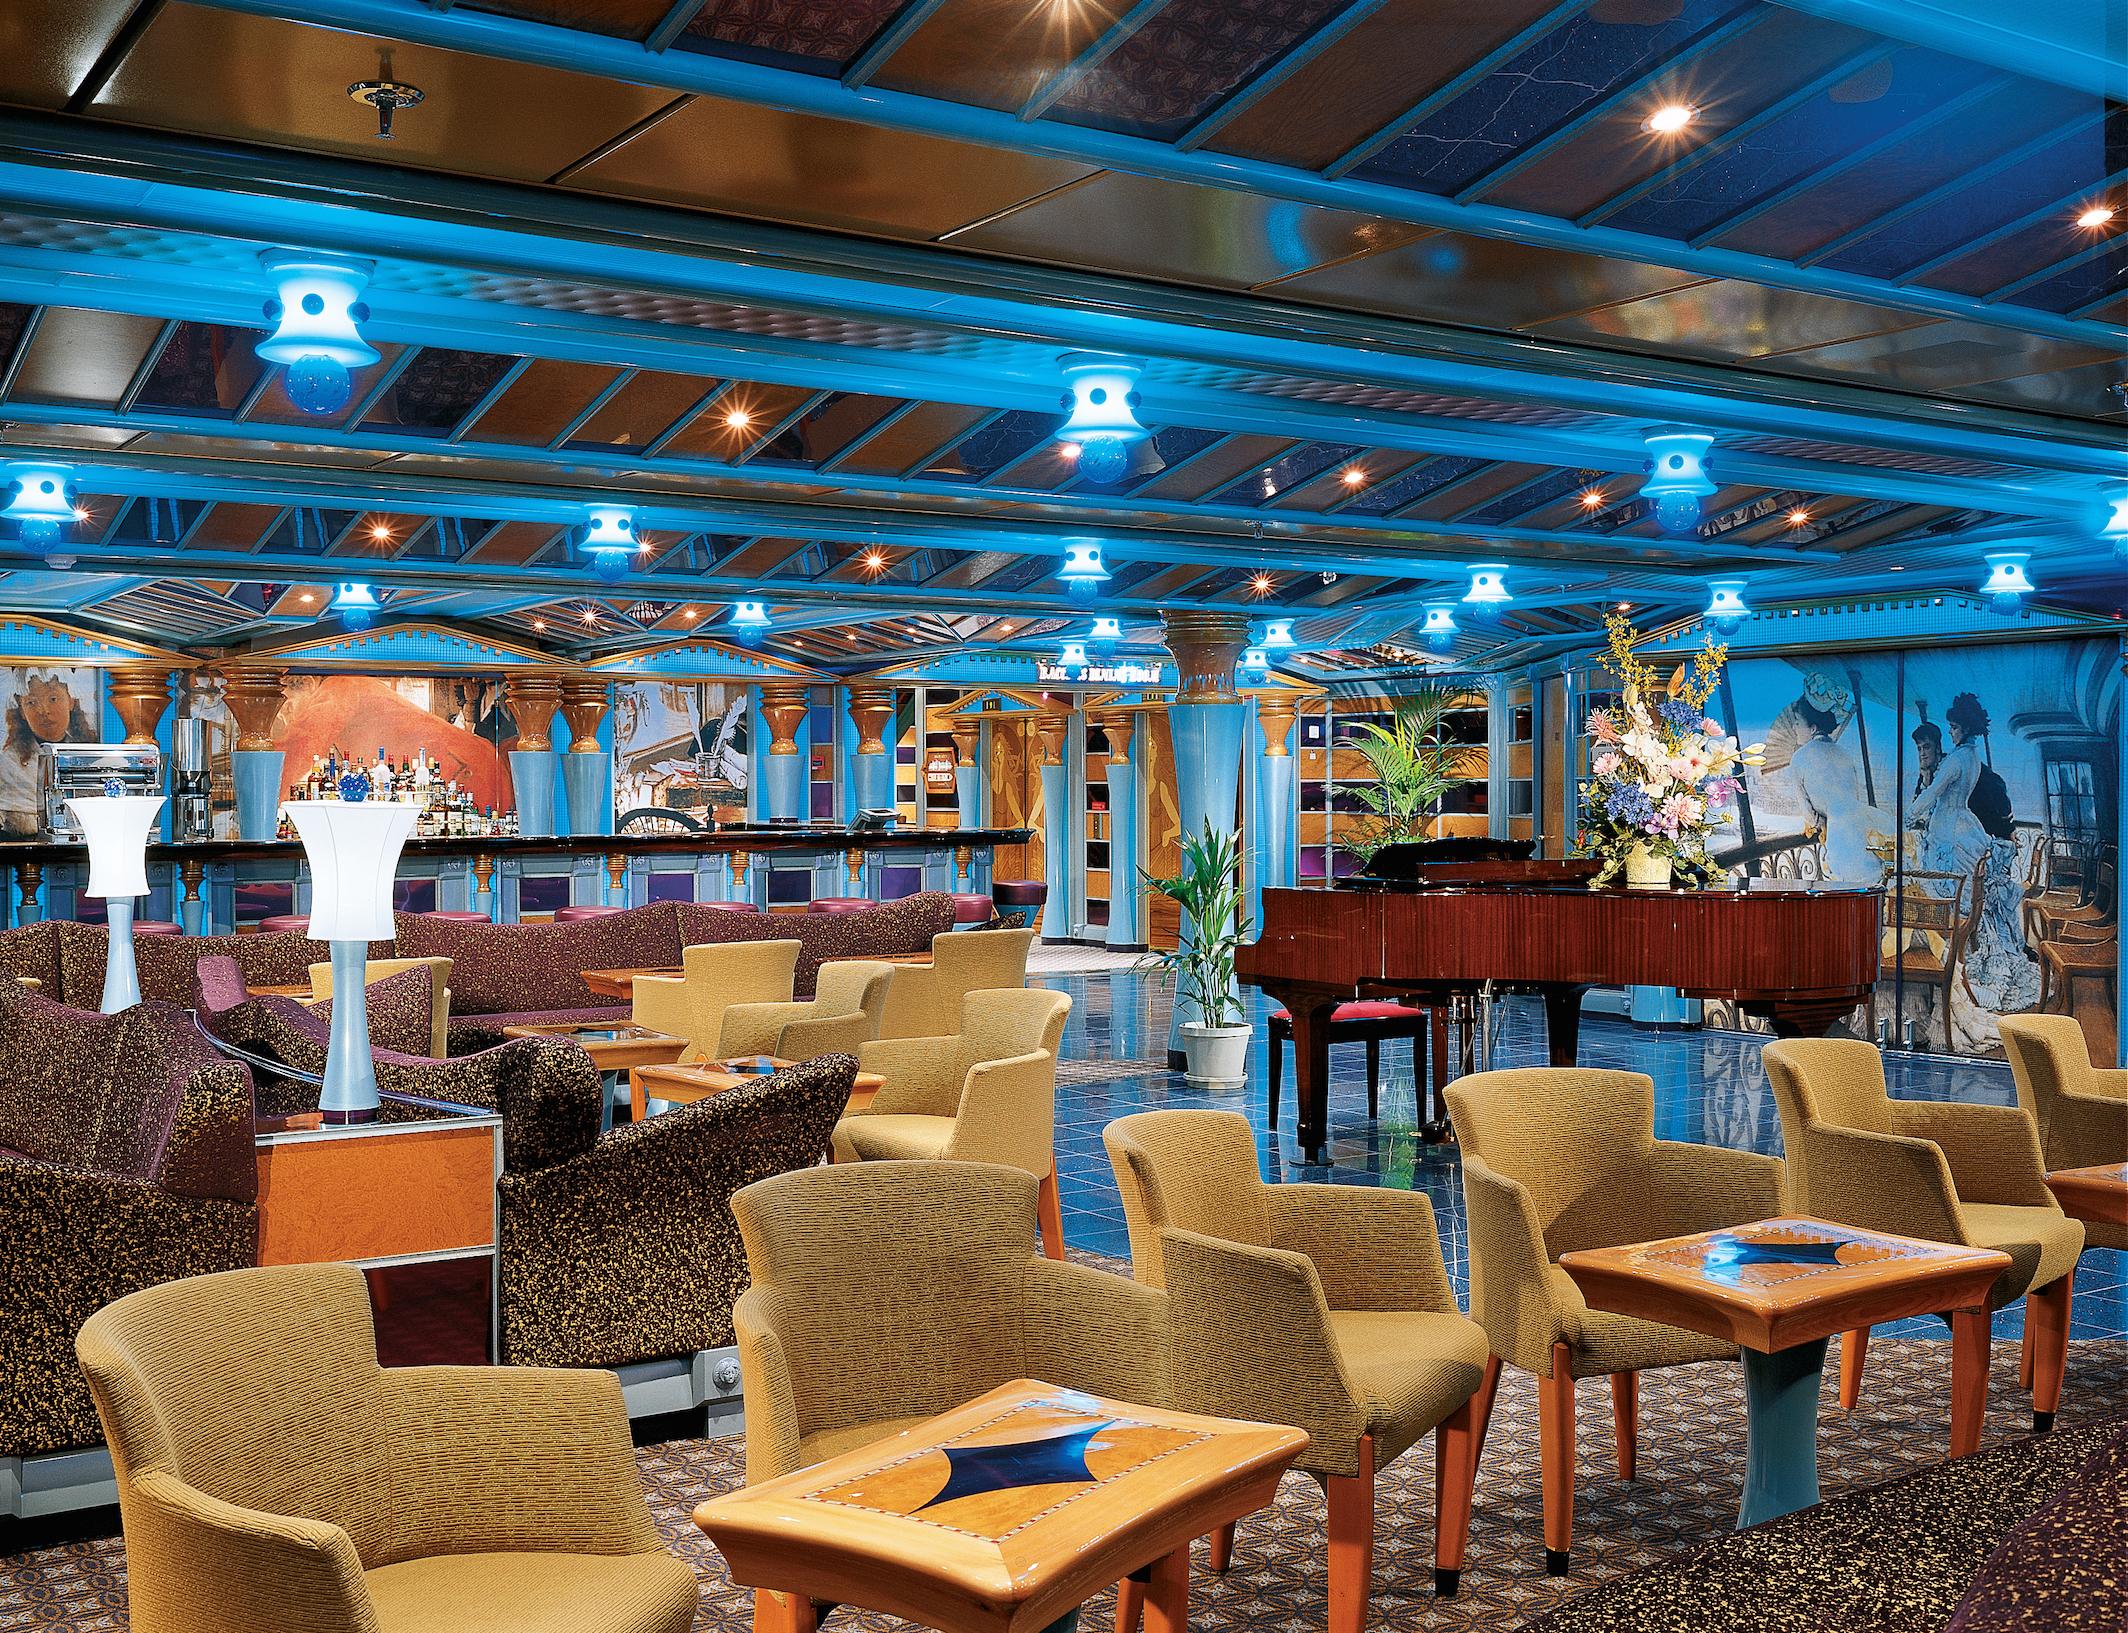 Carnival Miracle Gotham Lounge 2.jpg